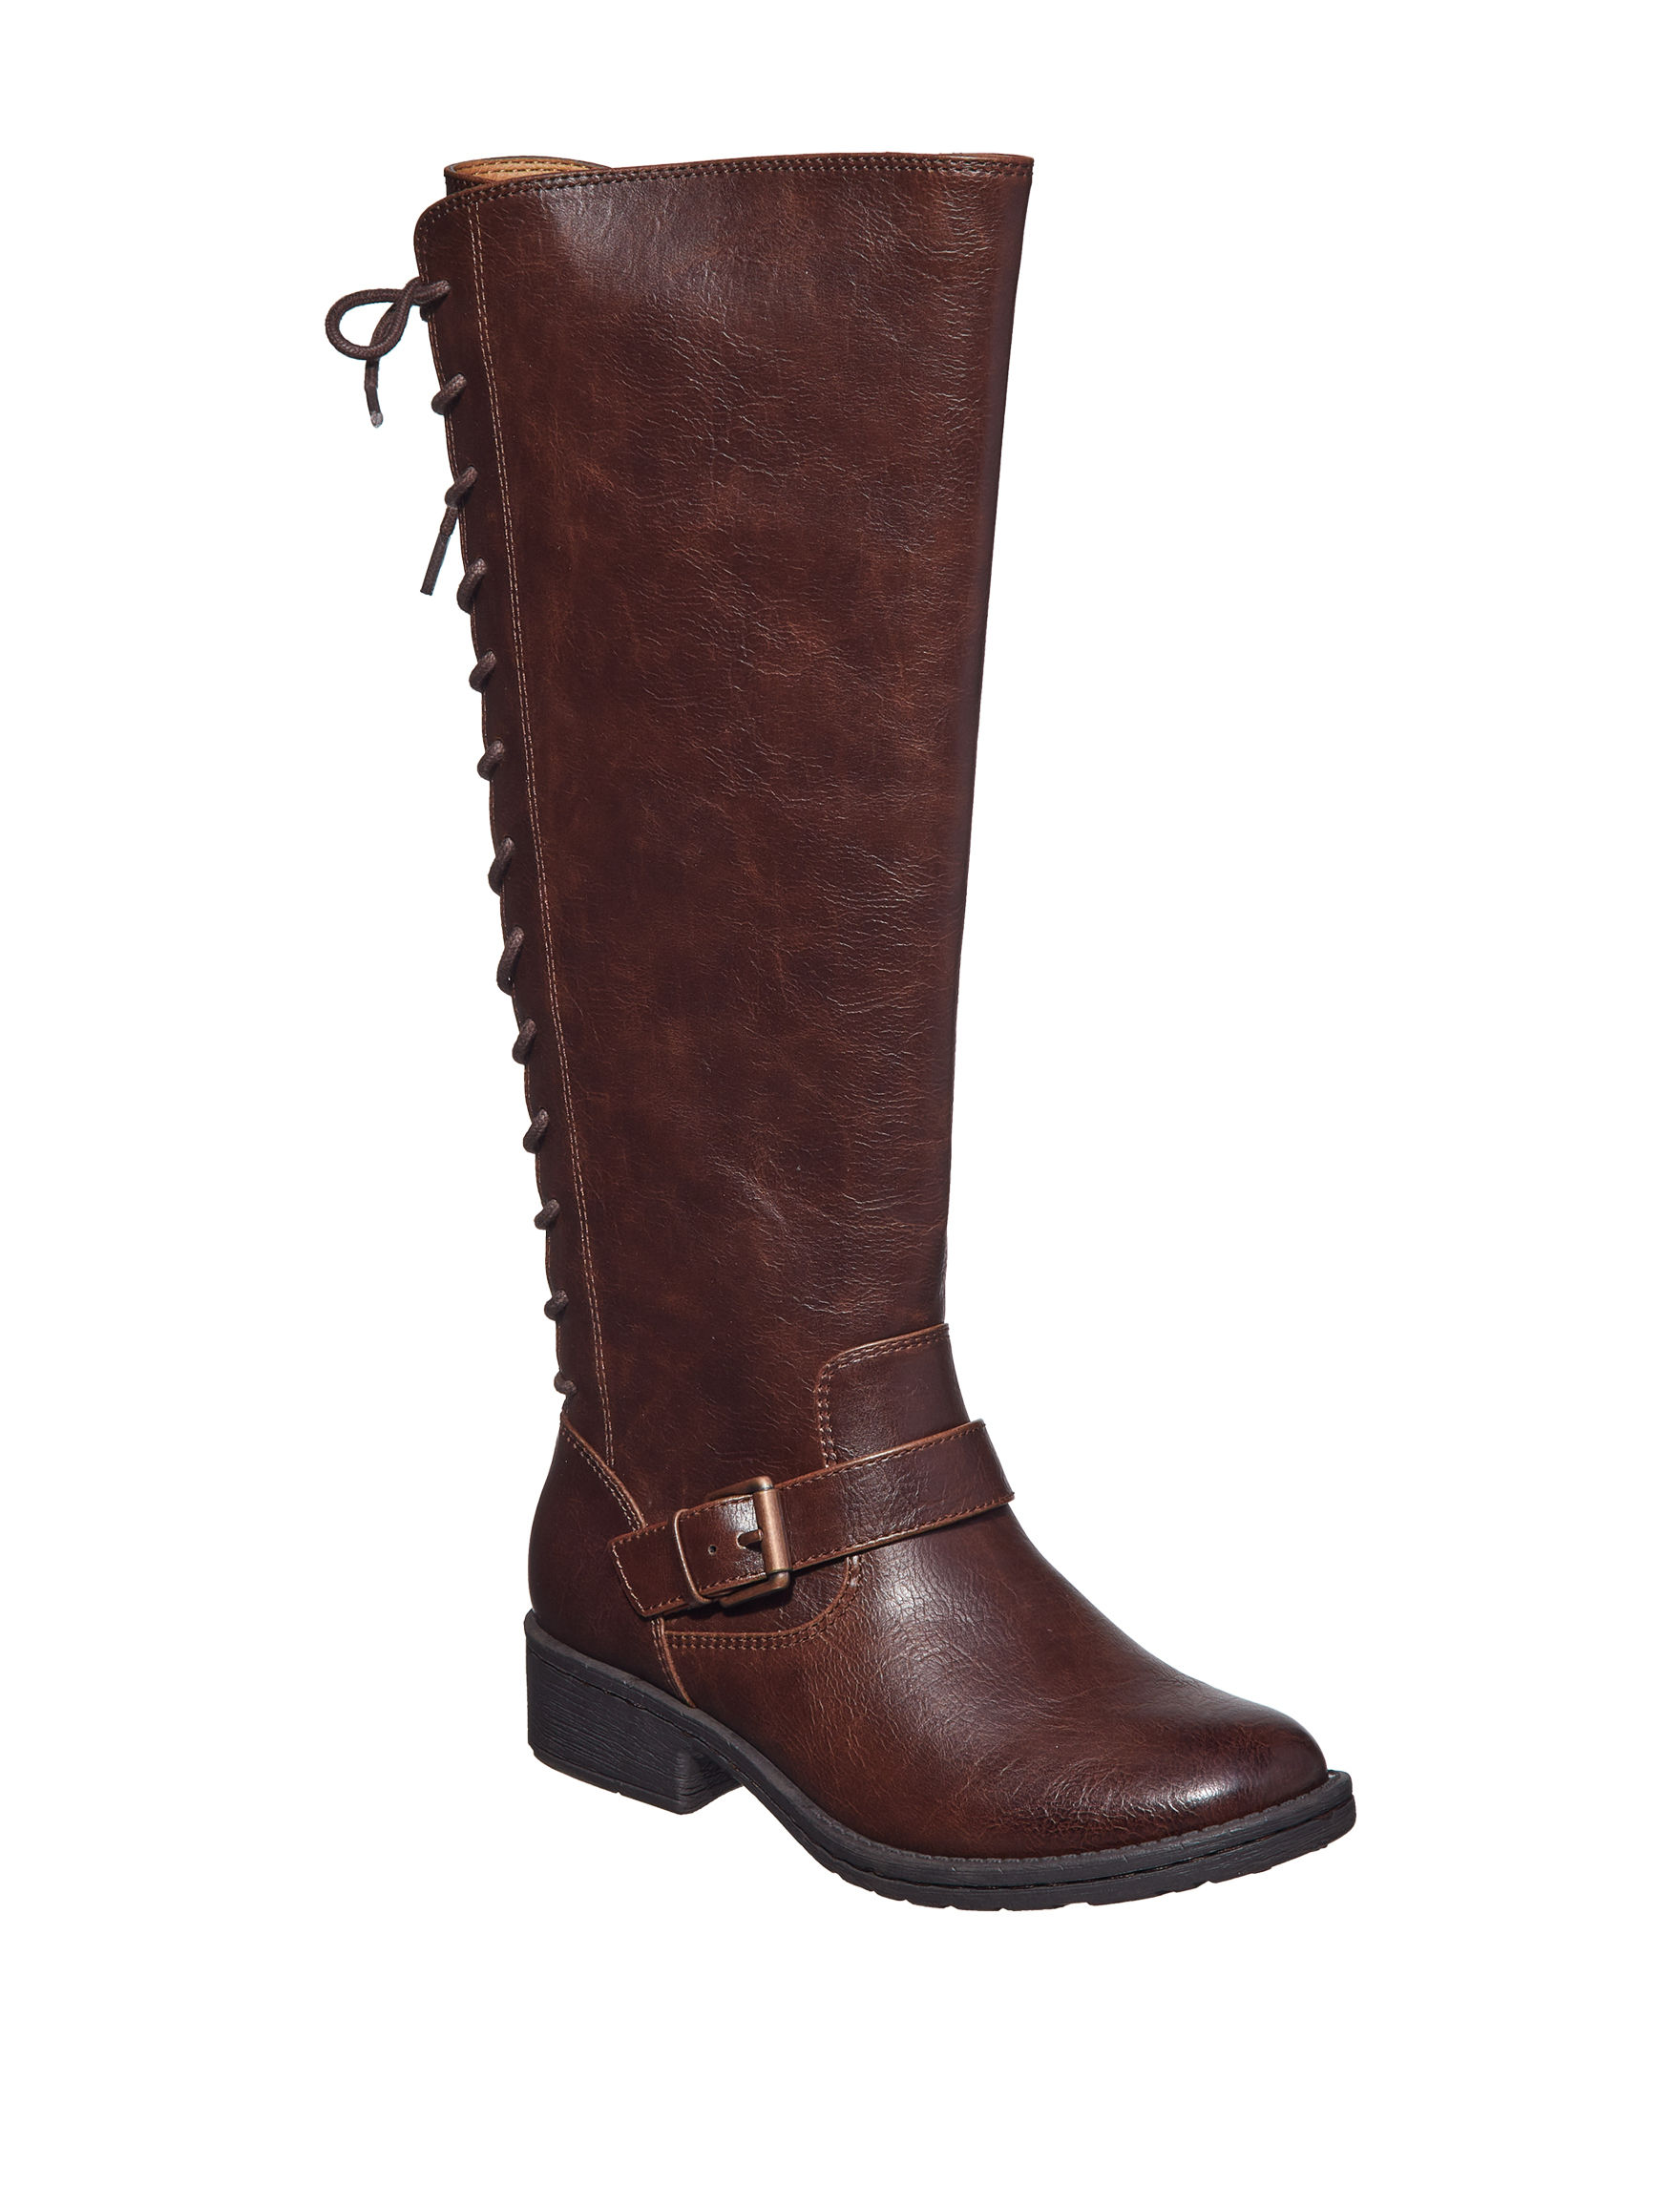 Eurosoft Brown Riding Boots